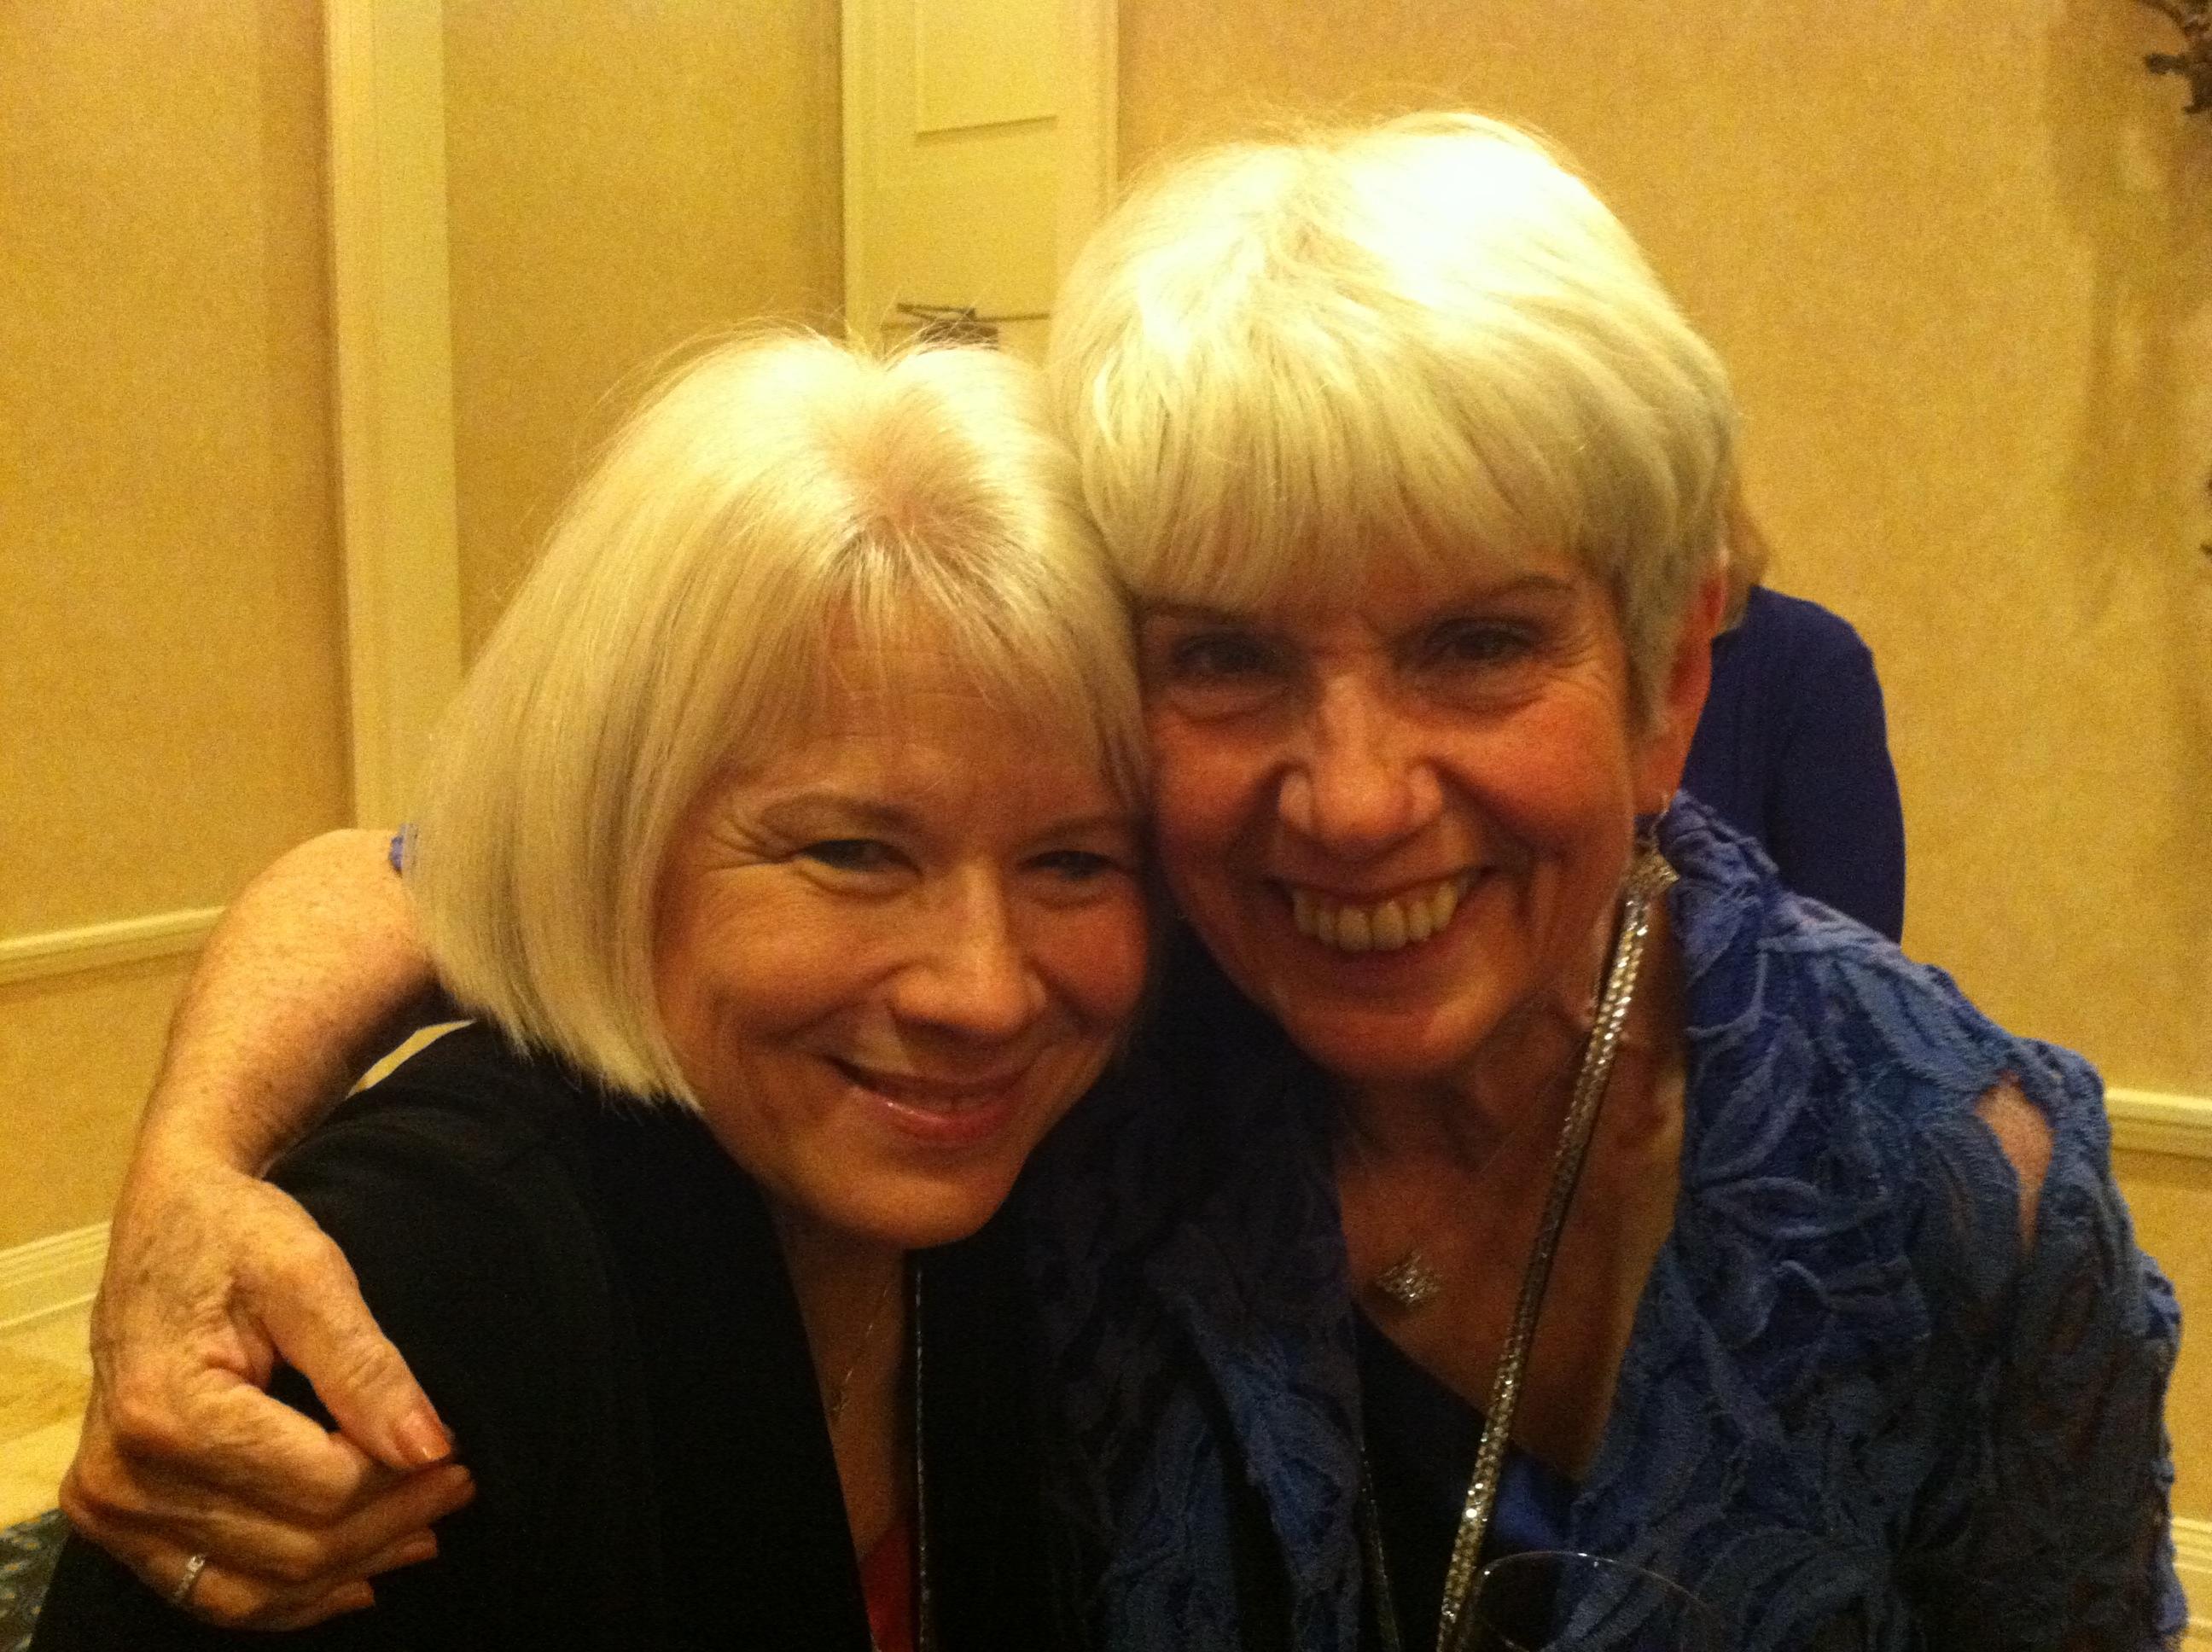 Sharon and Celia